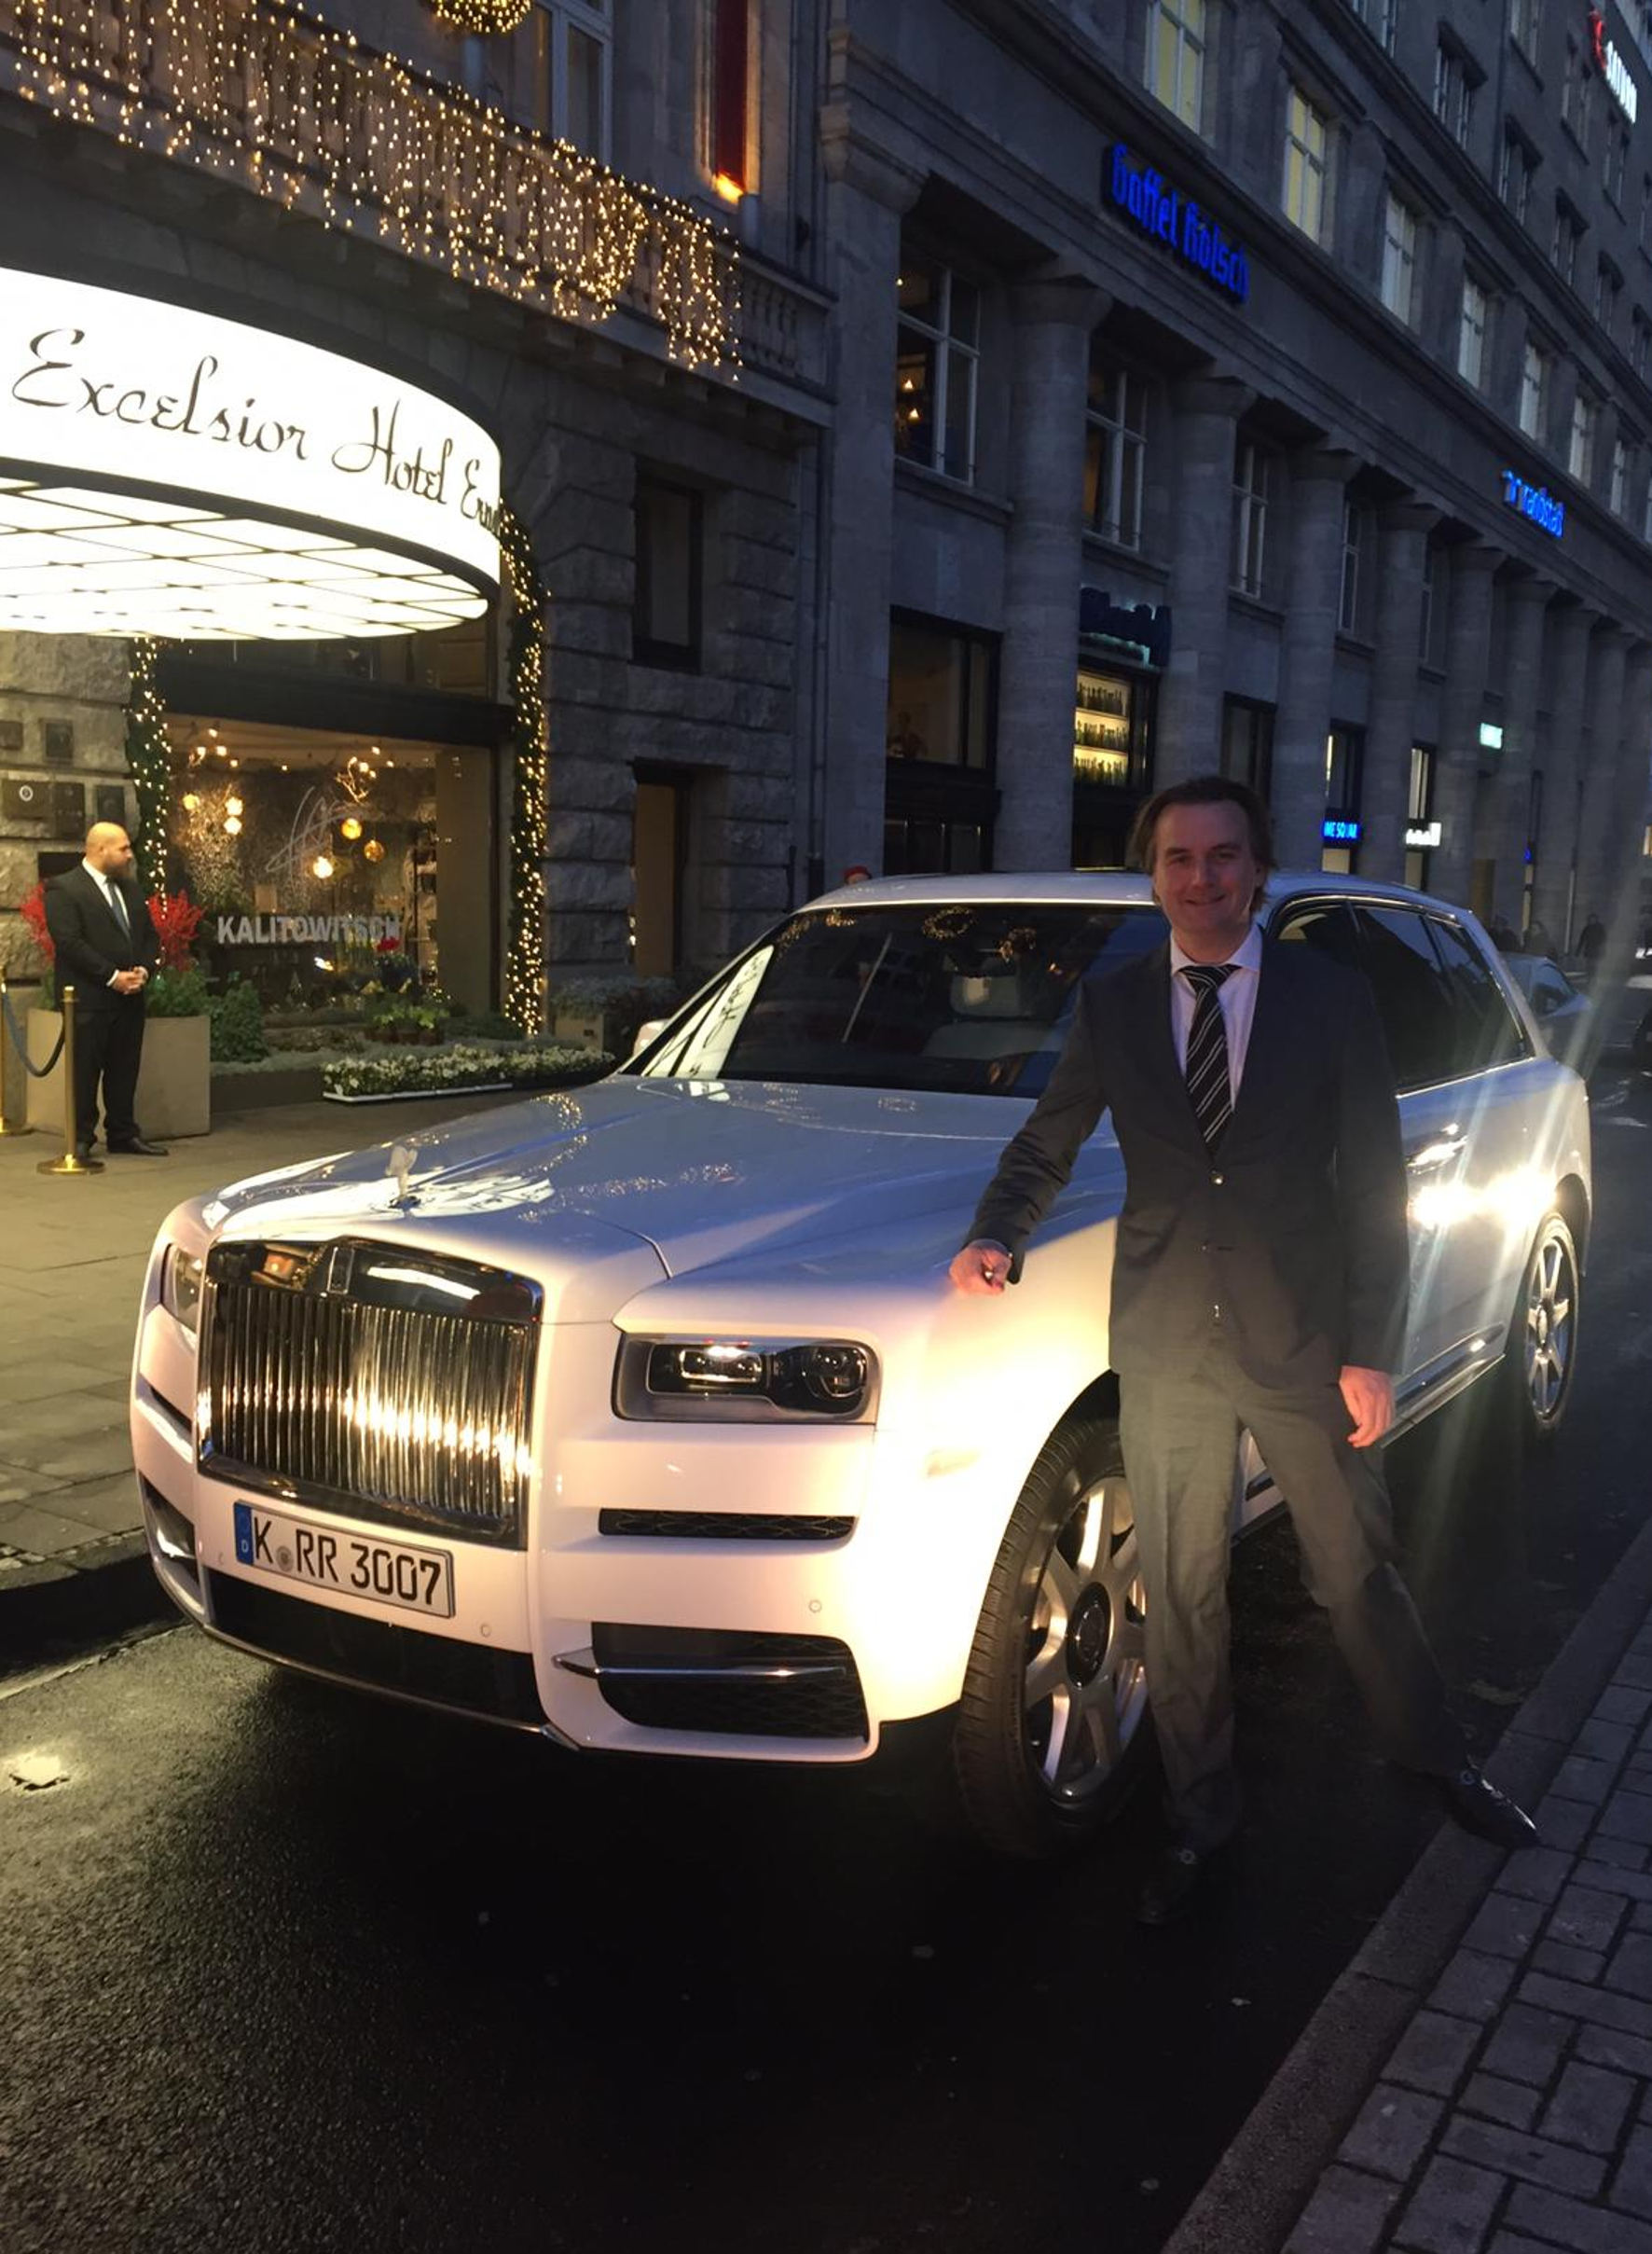 mid Köln - Lifestyle-Redakteur Lars Wallerang bei der Präsentation des Rolls-Royce Cullinan vor dem Excelsior Hotel Ernst. Frank Zobel / mid